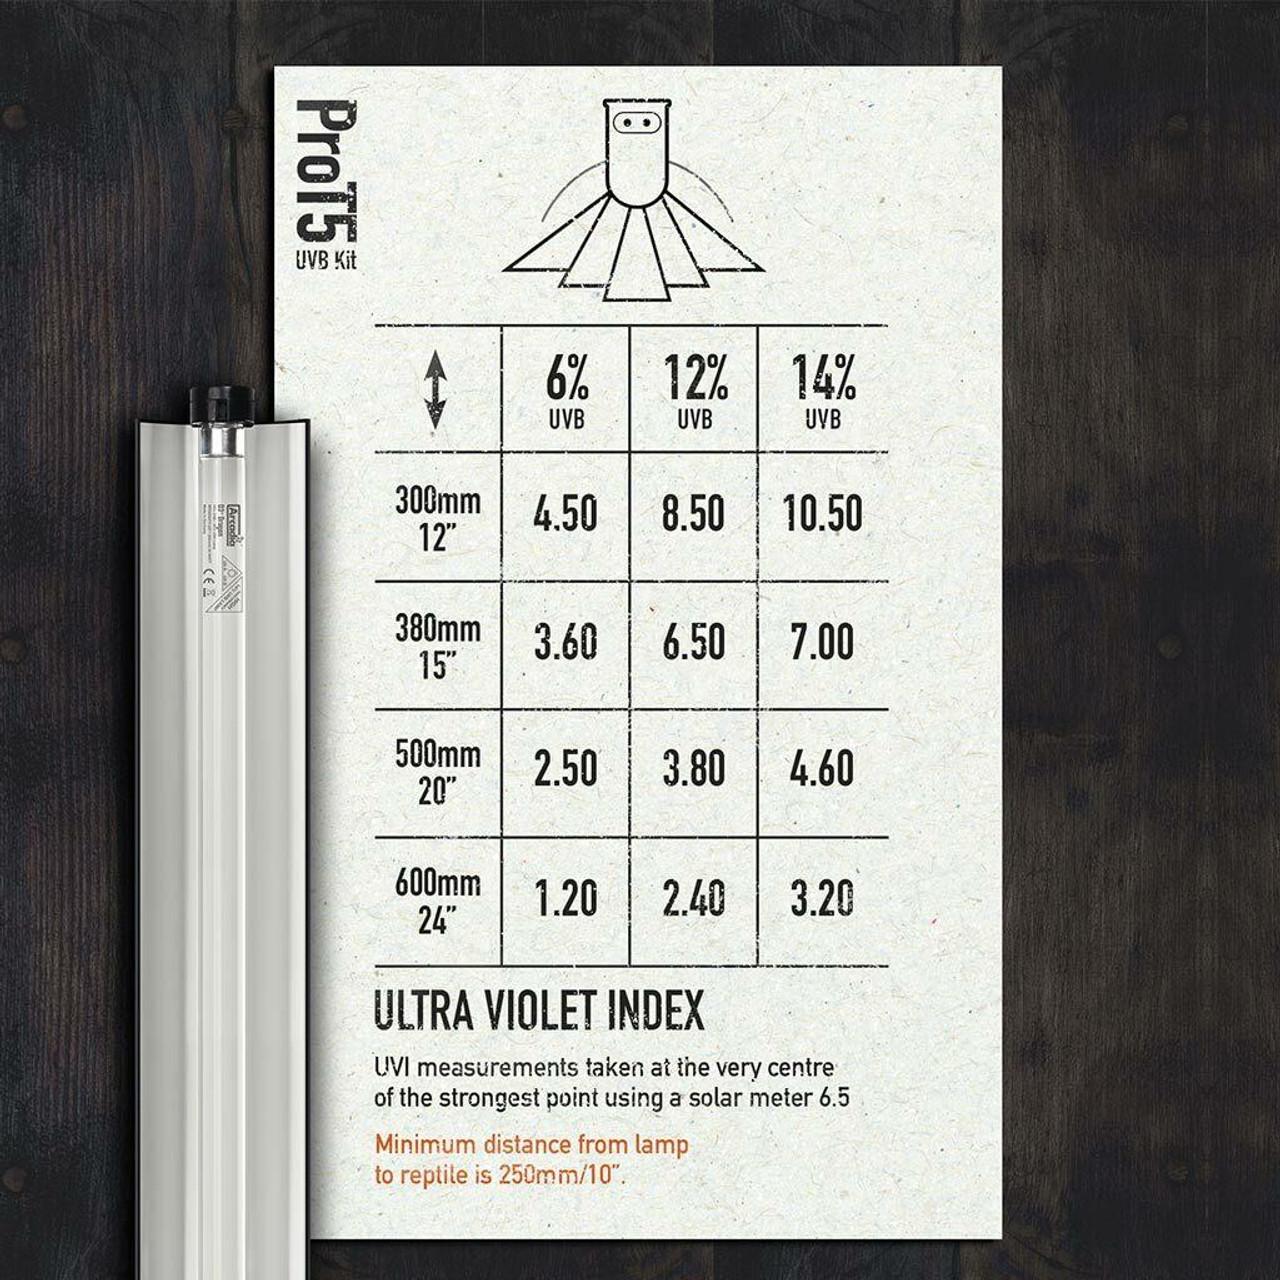 Arcadia Arcadia PRO T5 UVB KIT With 12percent Desert Lamp 24W-22.5